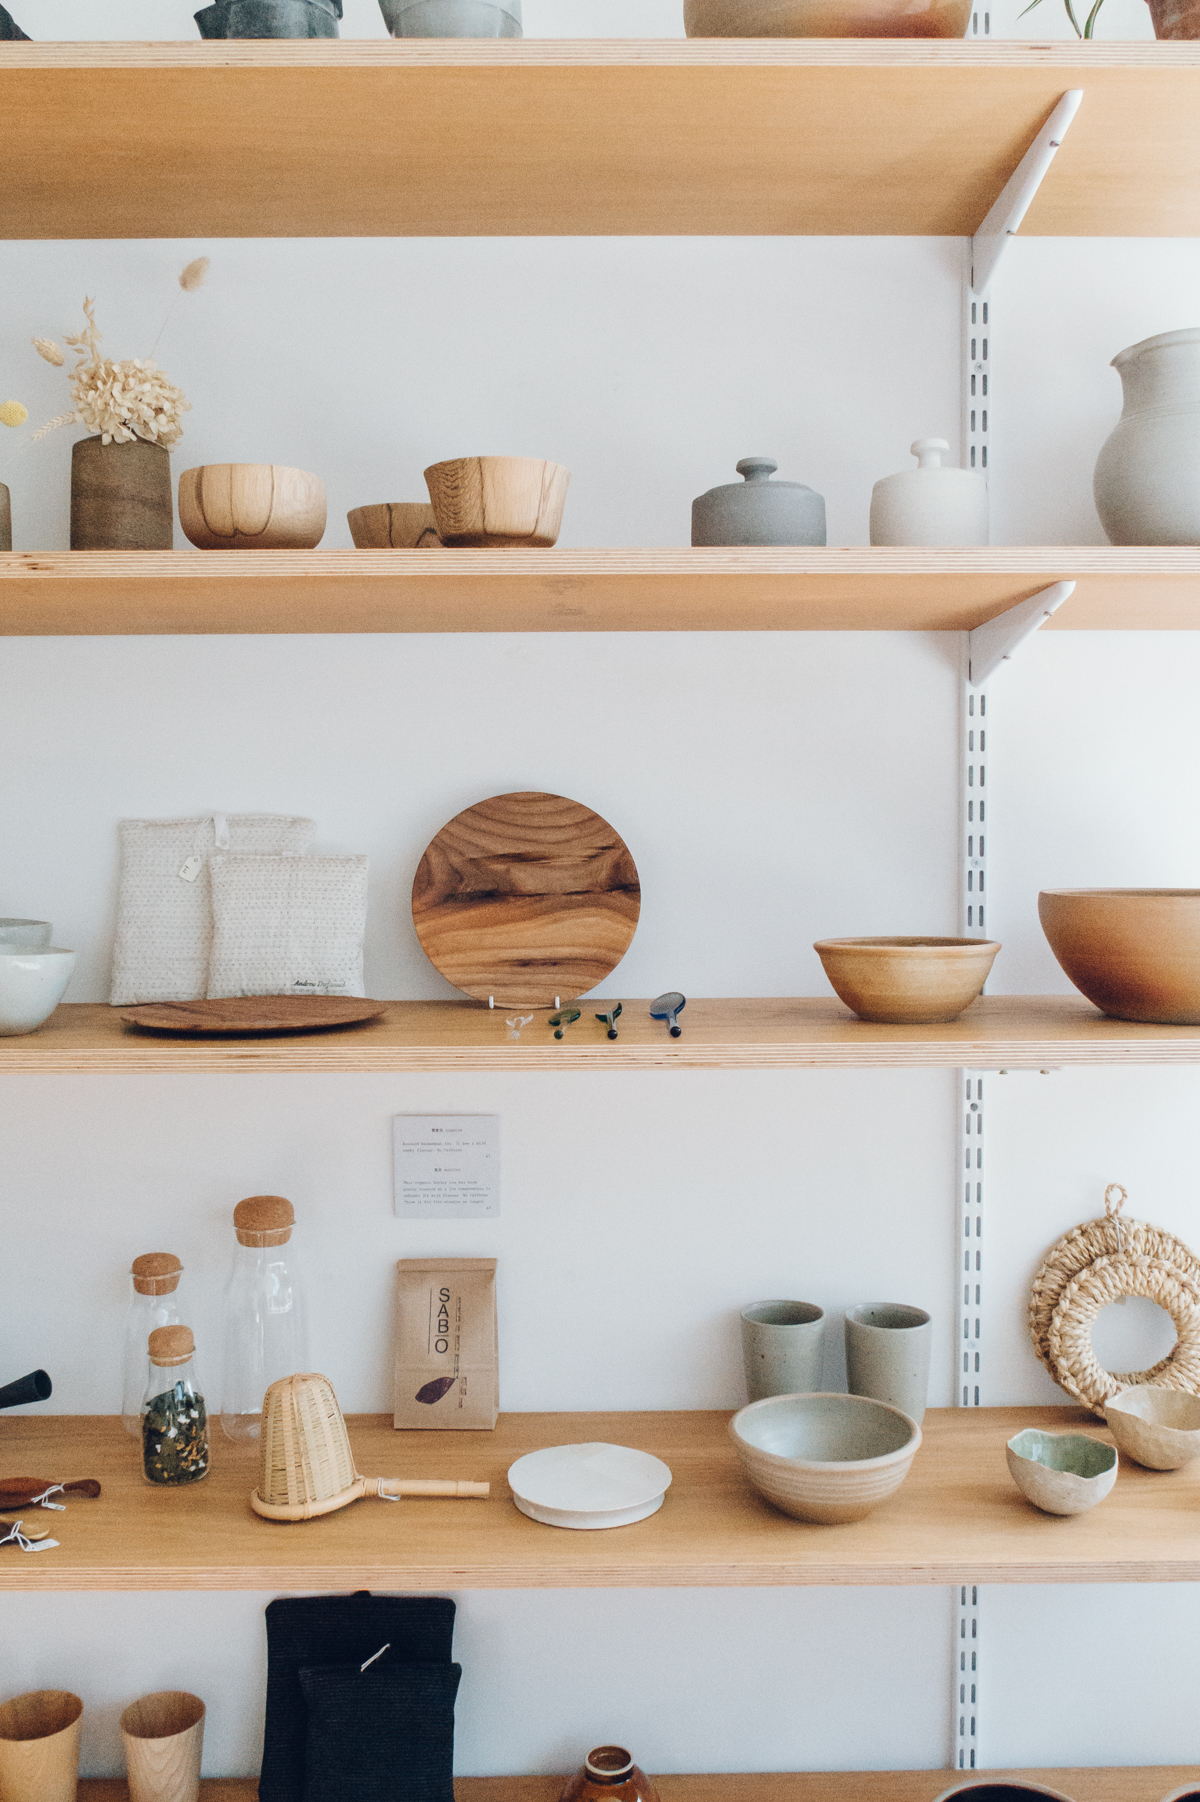 Shelves of ceramics and beautiful handmade items